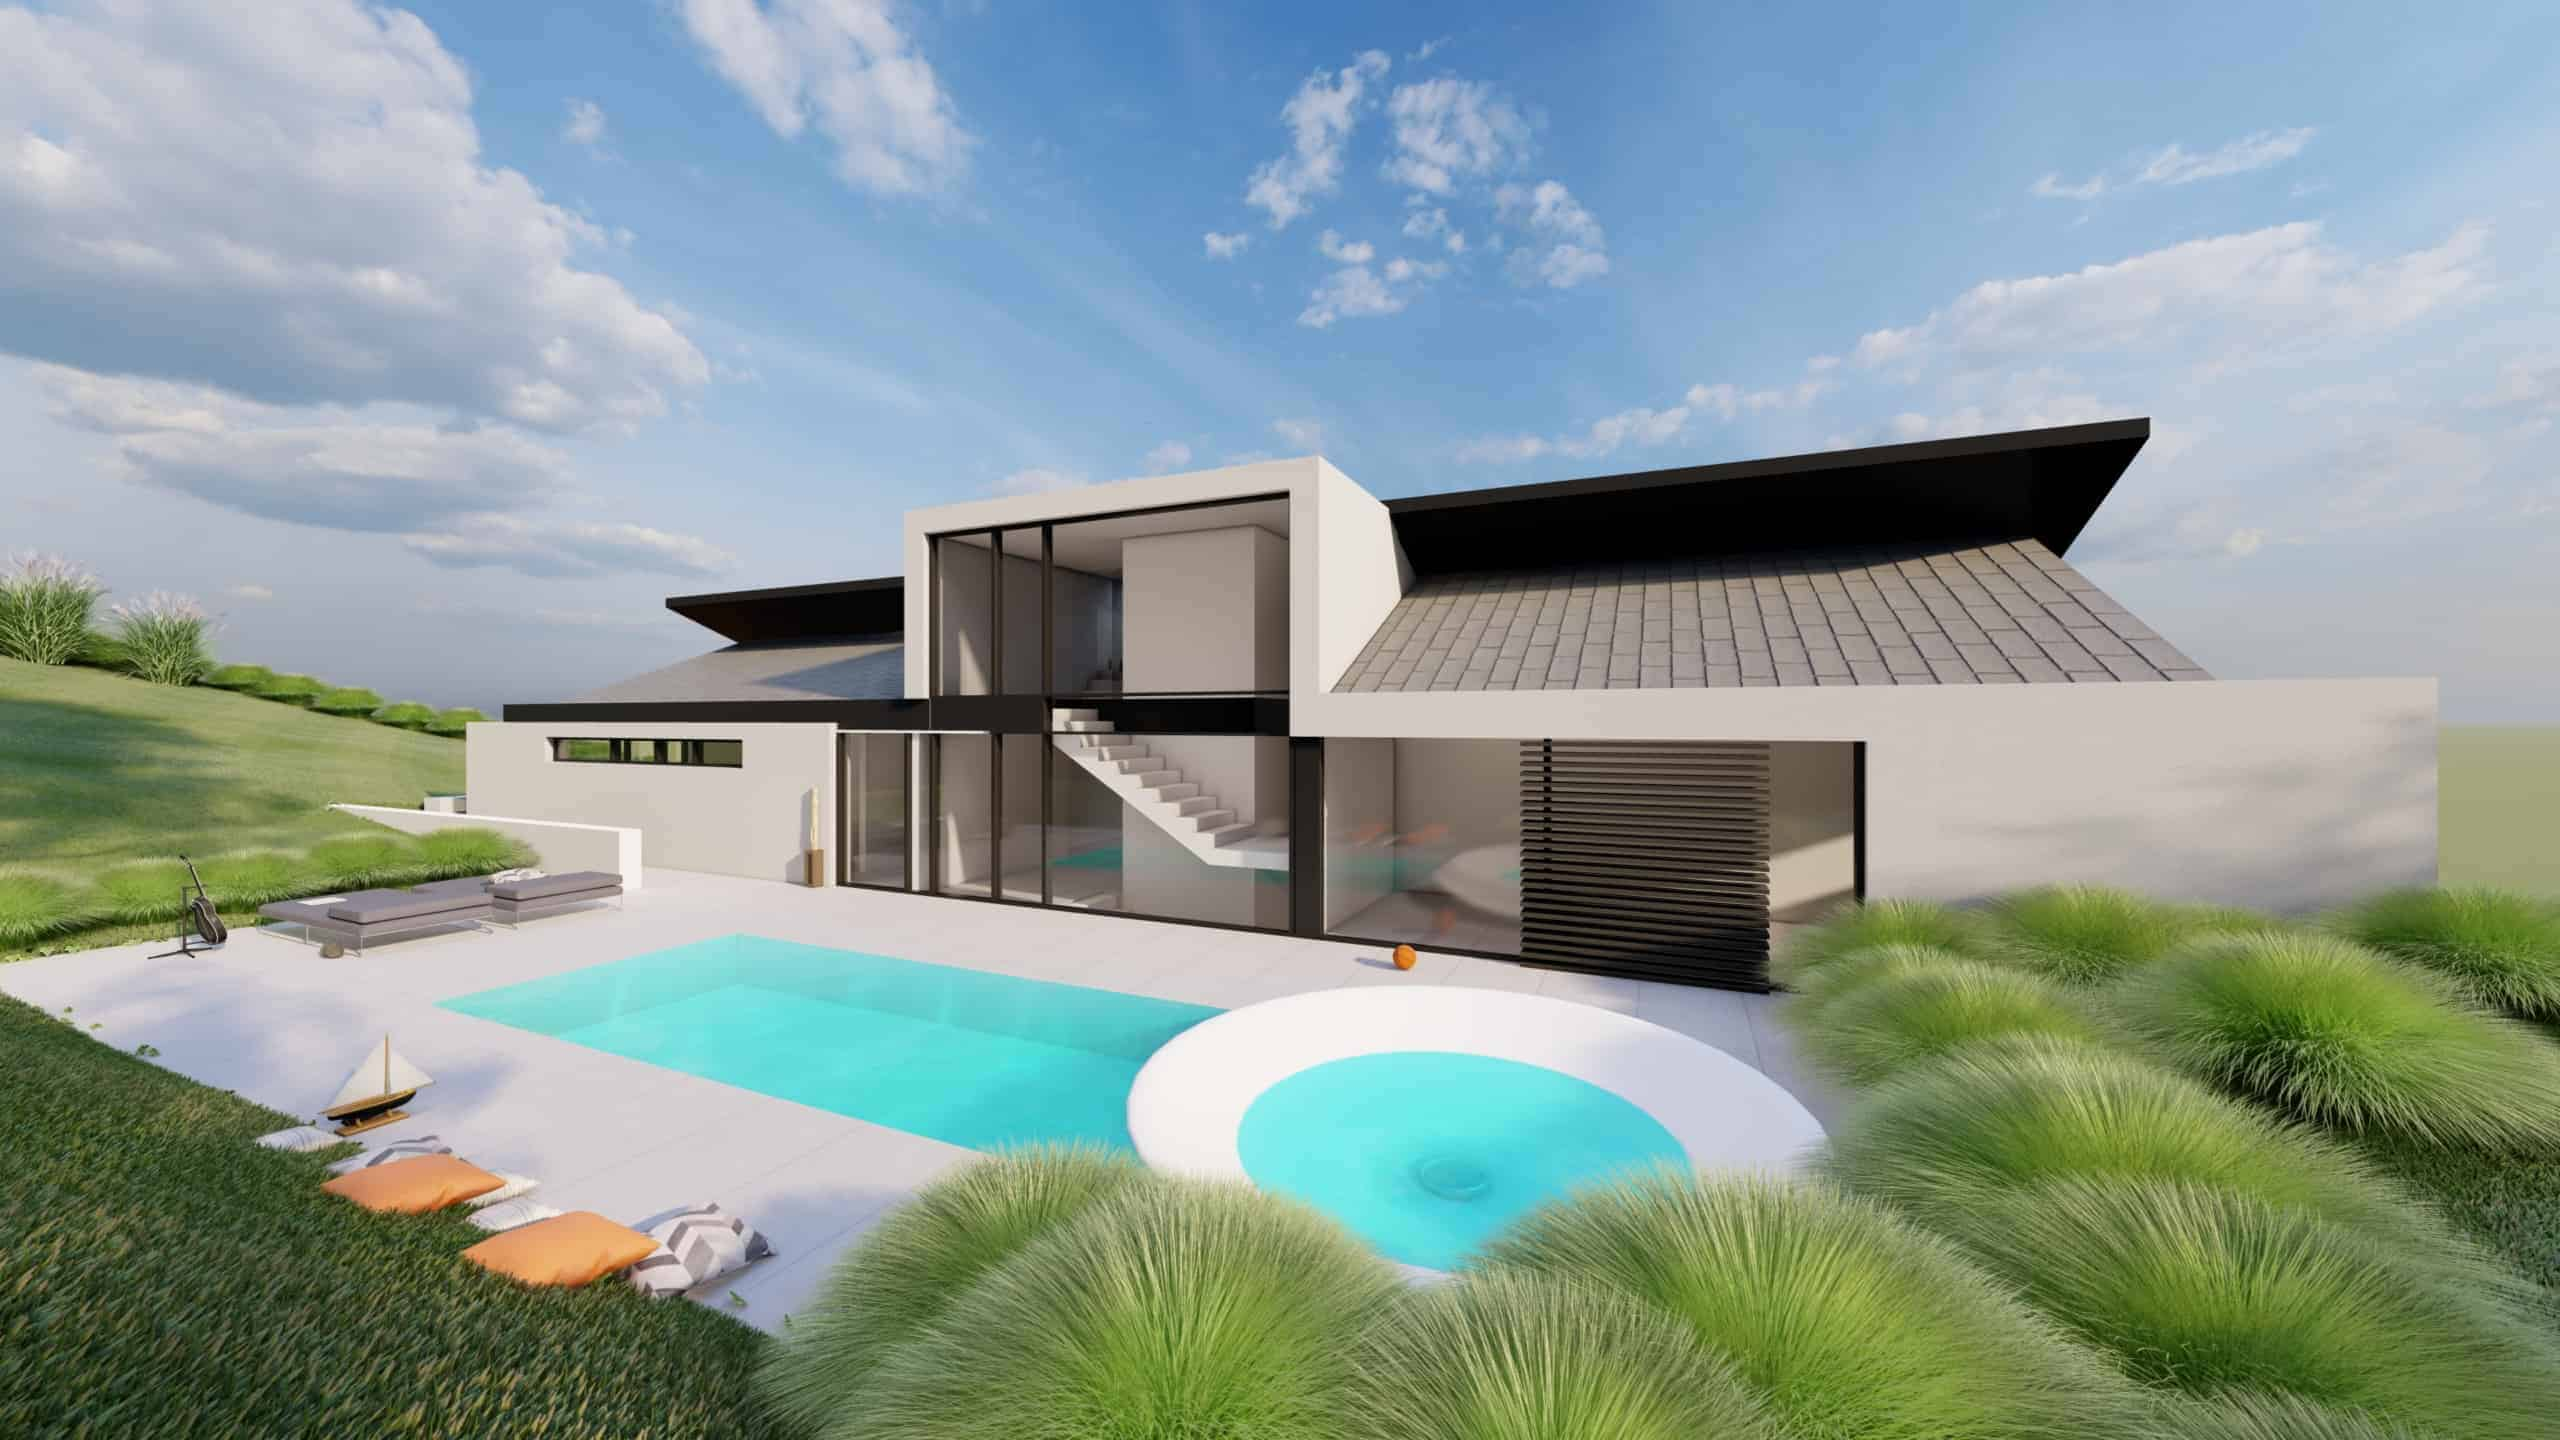 Satteldachhaus mit Pool